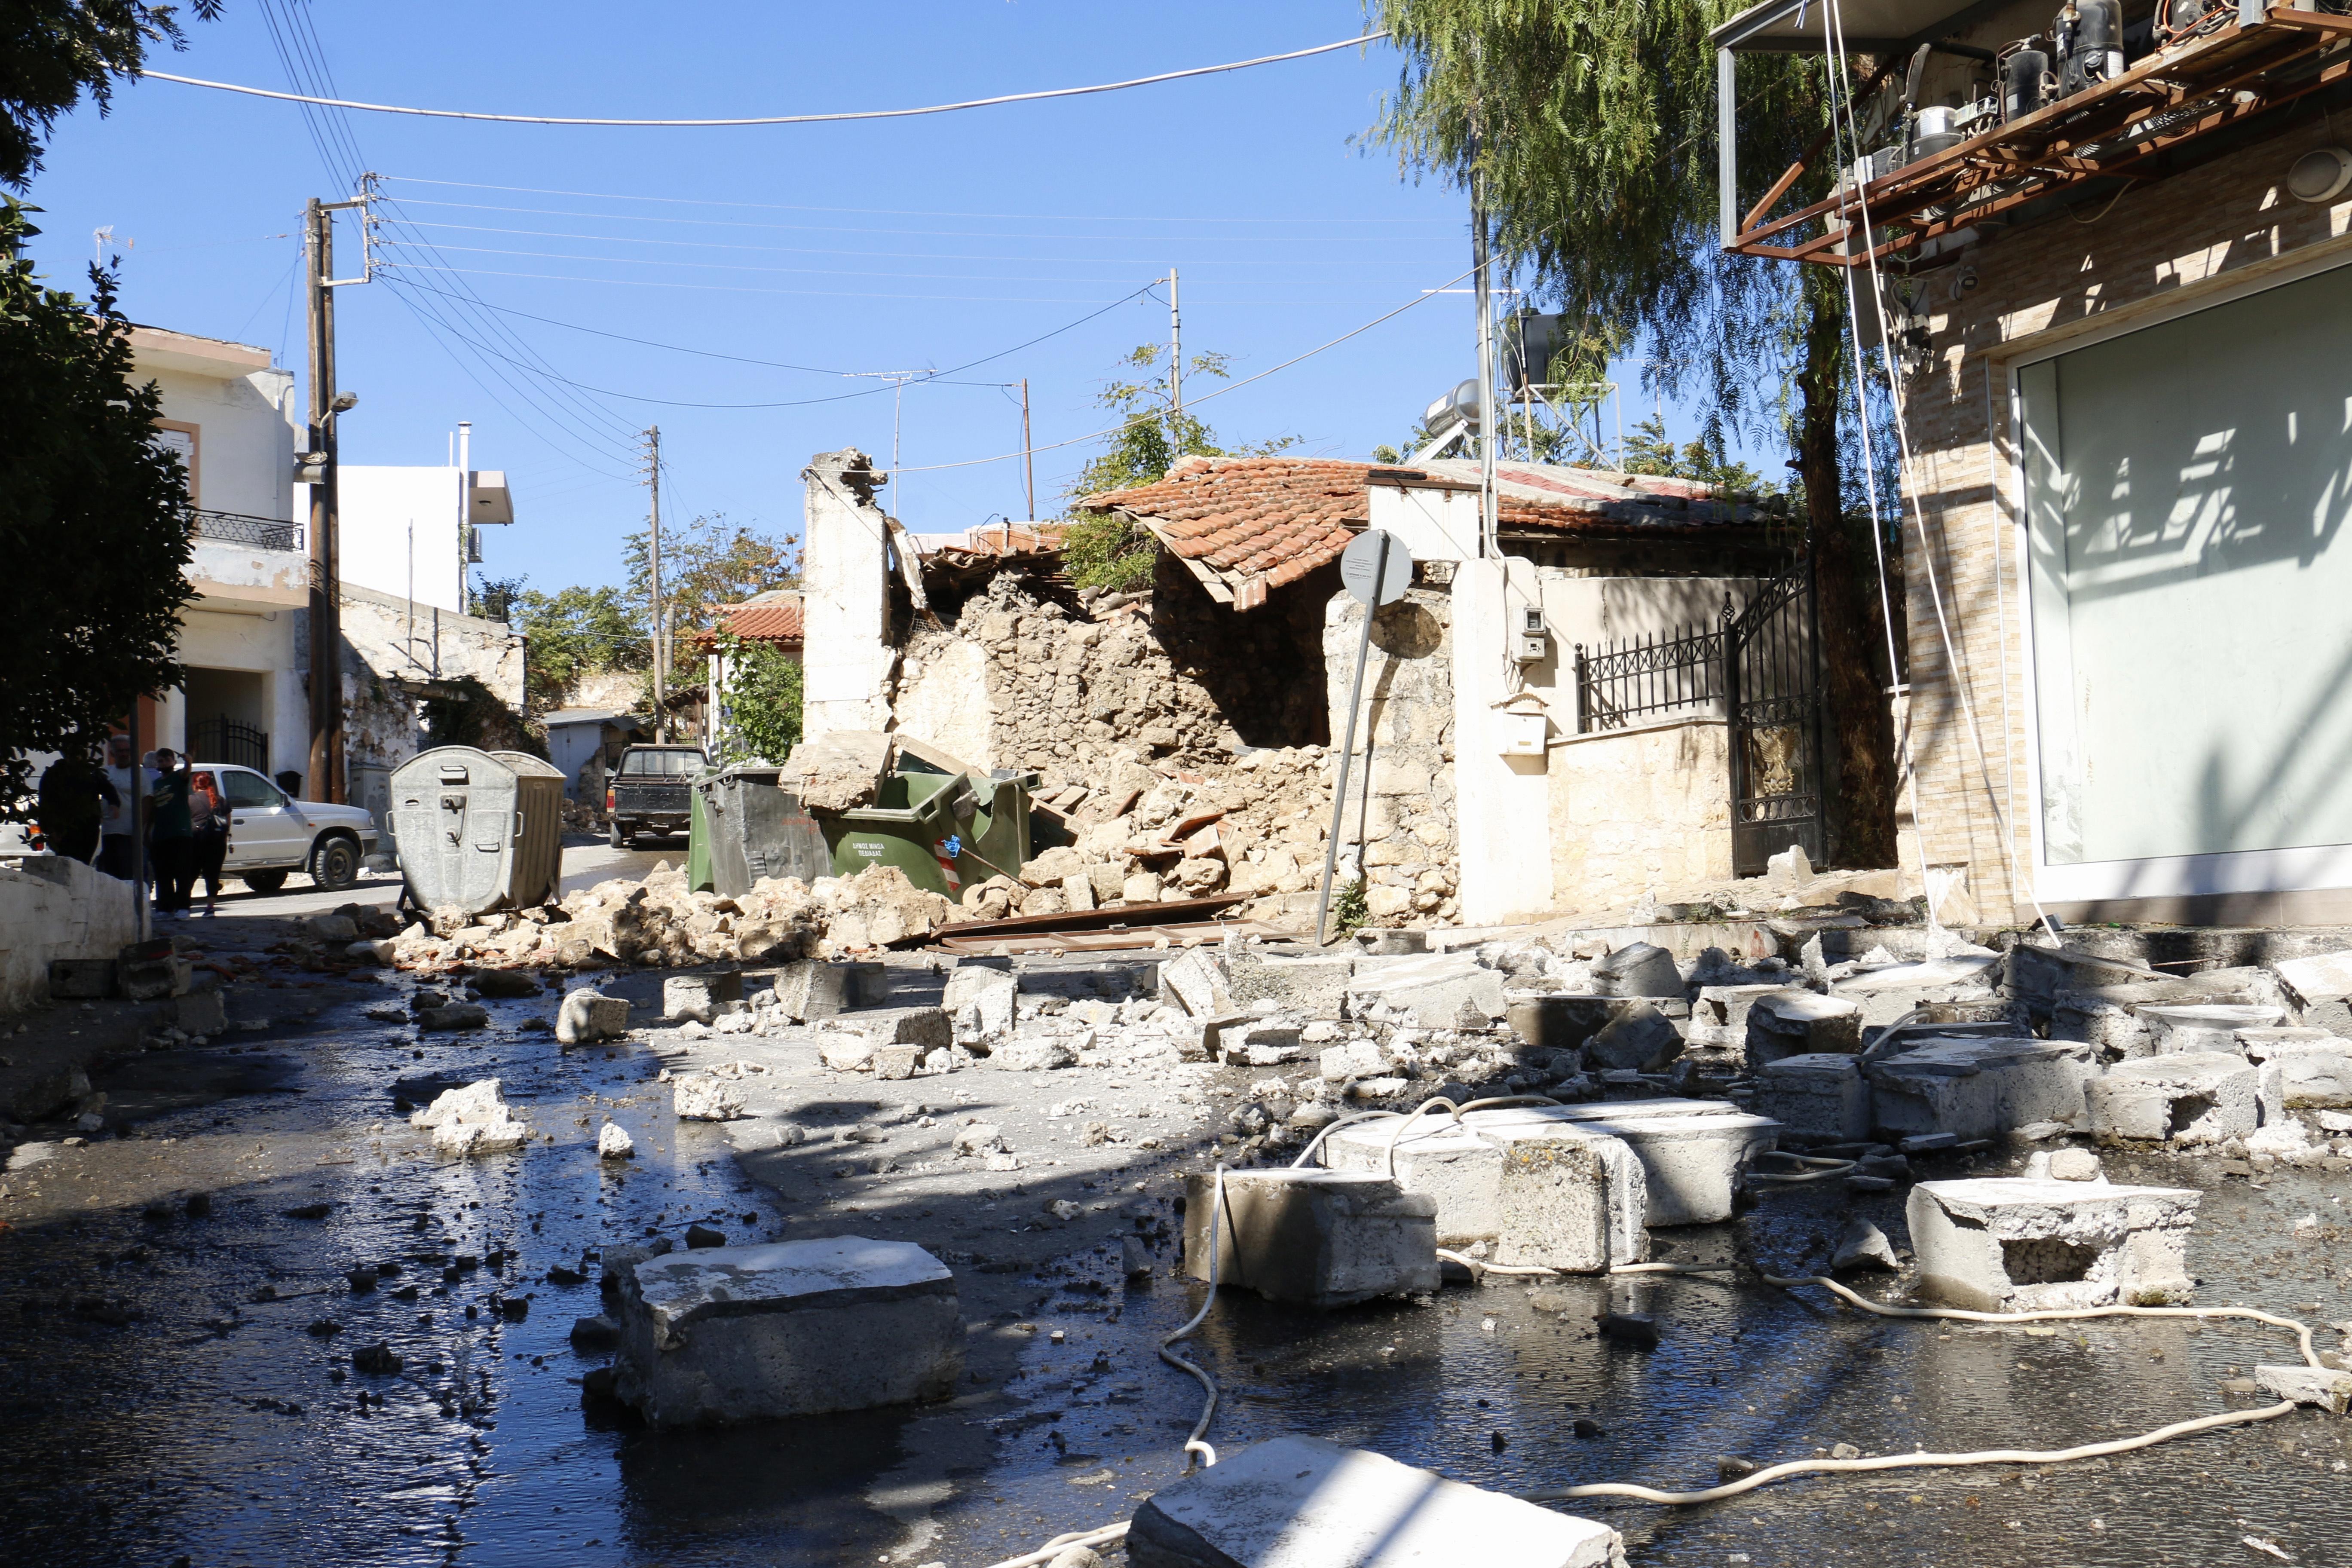 strong-quake-hits-greek-island-of-crete-one-dead-20-injured1